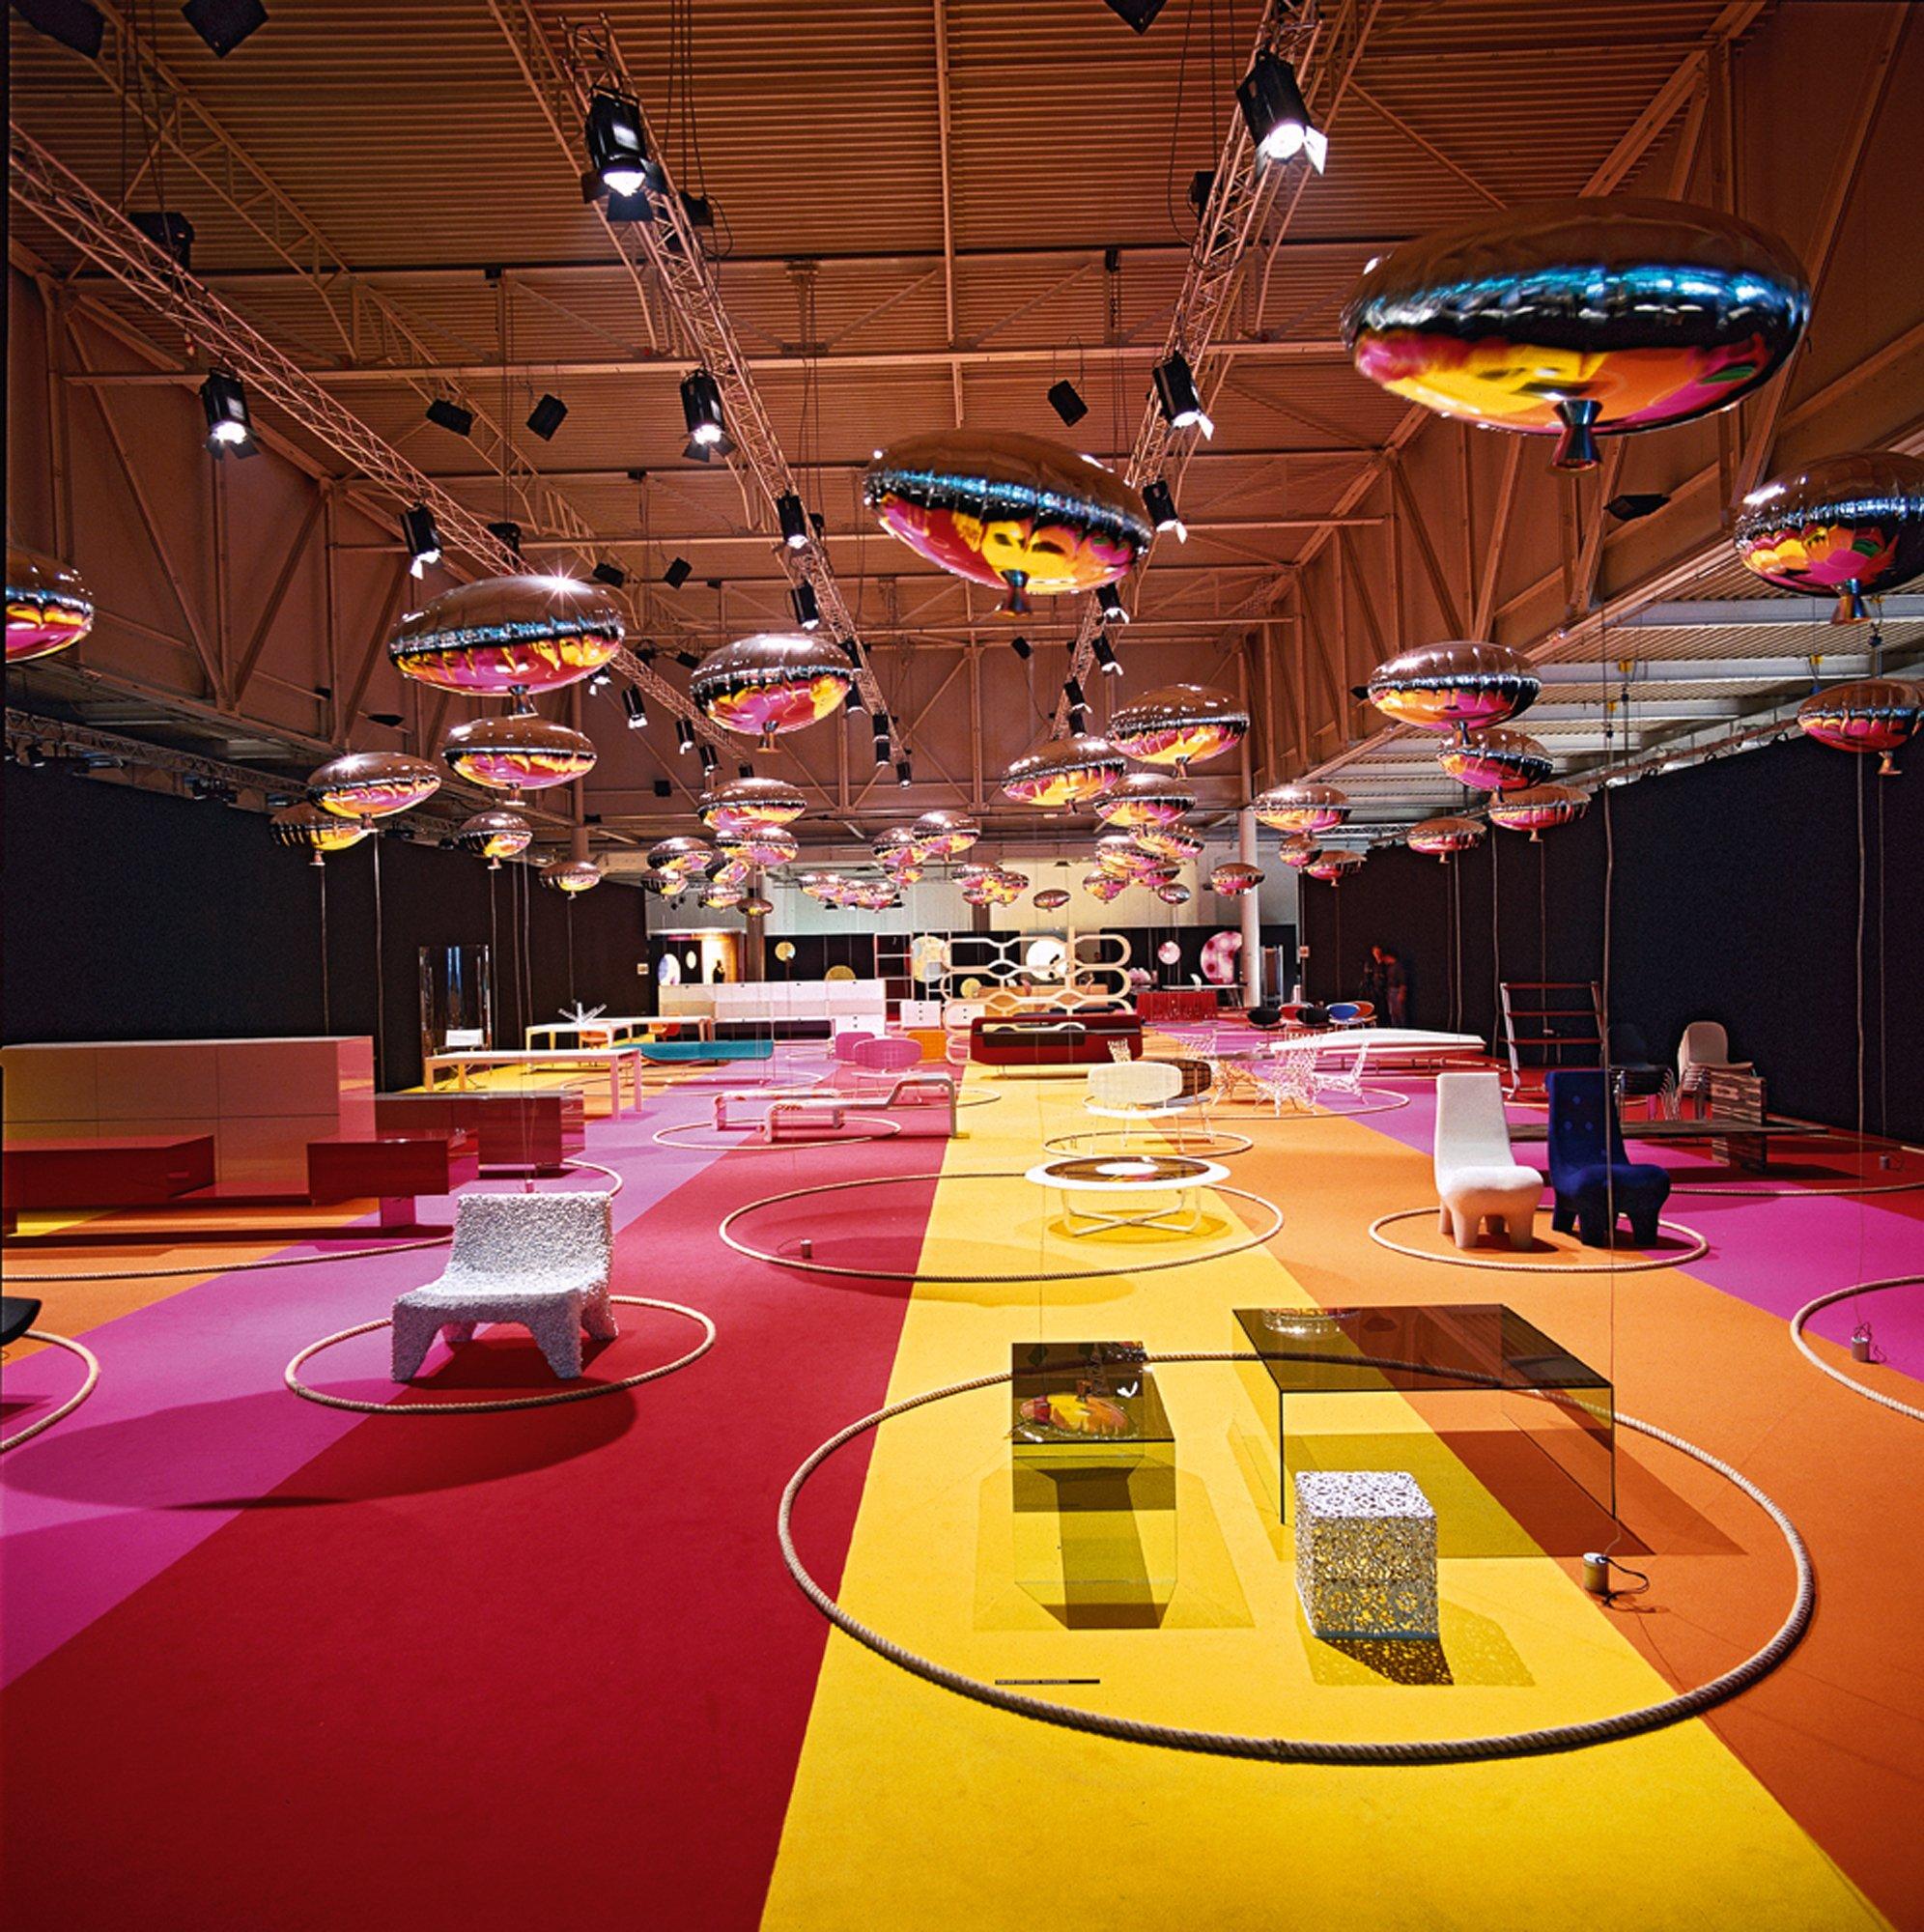 Cappellini Ausstellung im Superstudio Più in Mailand anlässlich des Salone del Mobile 2001. Foto: Cappellini